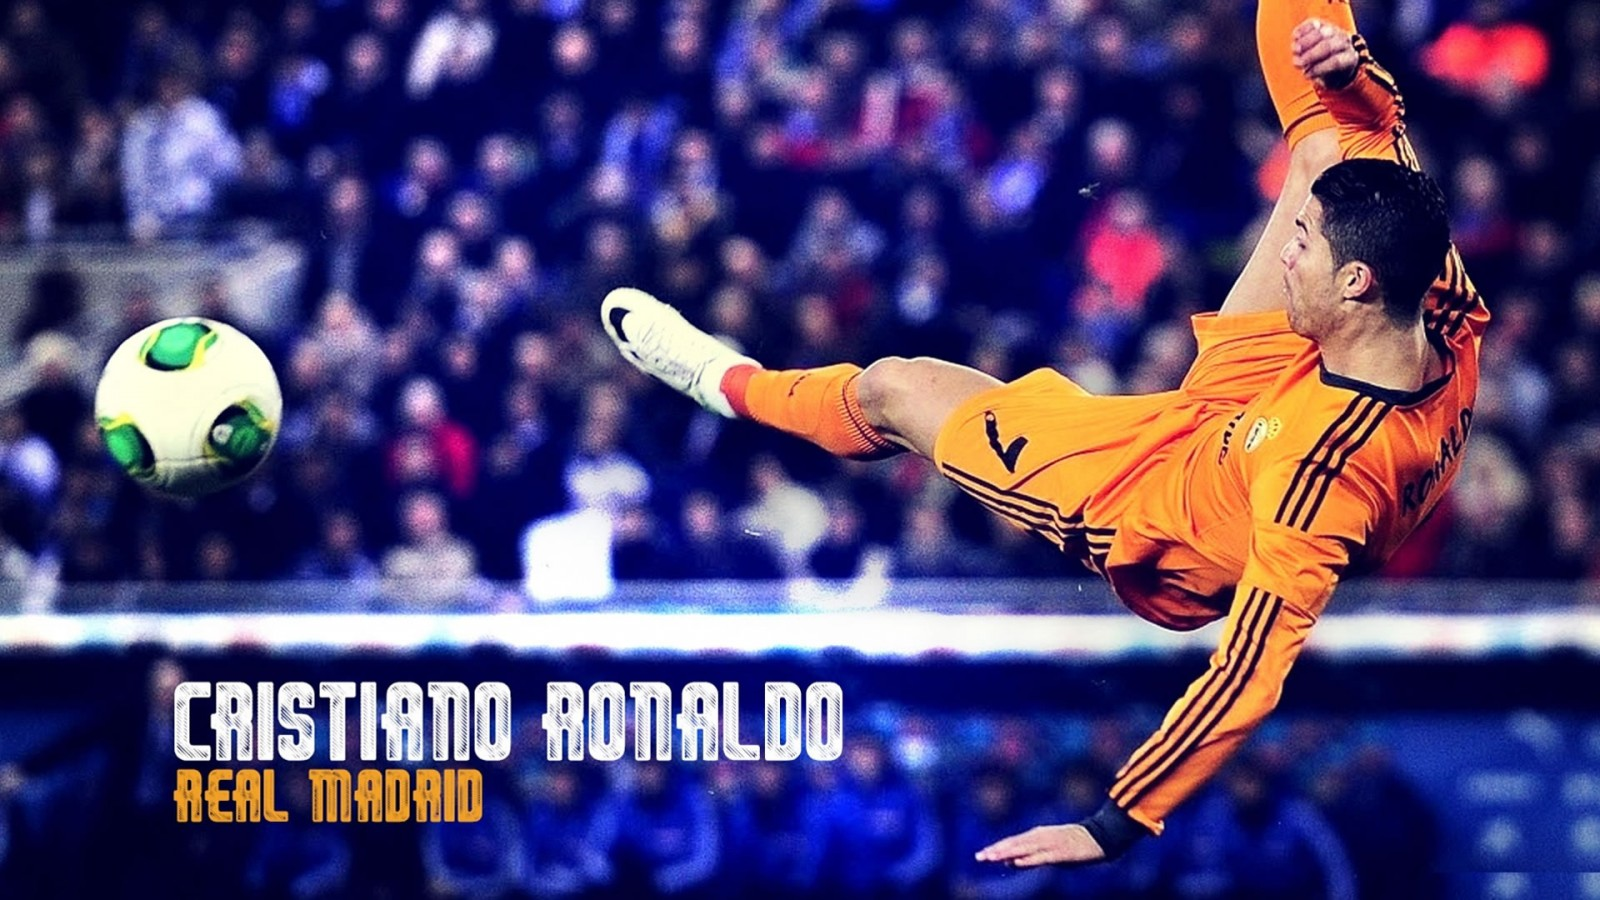 Cristiano Ronaldo bicycle kick wallpaper - Cristiano ...